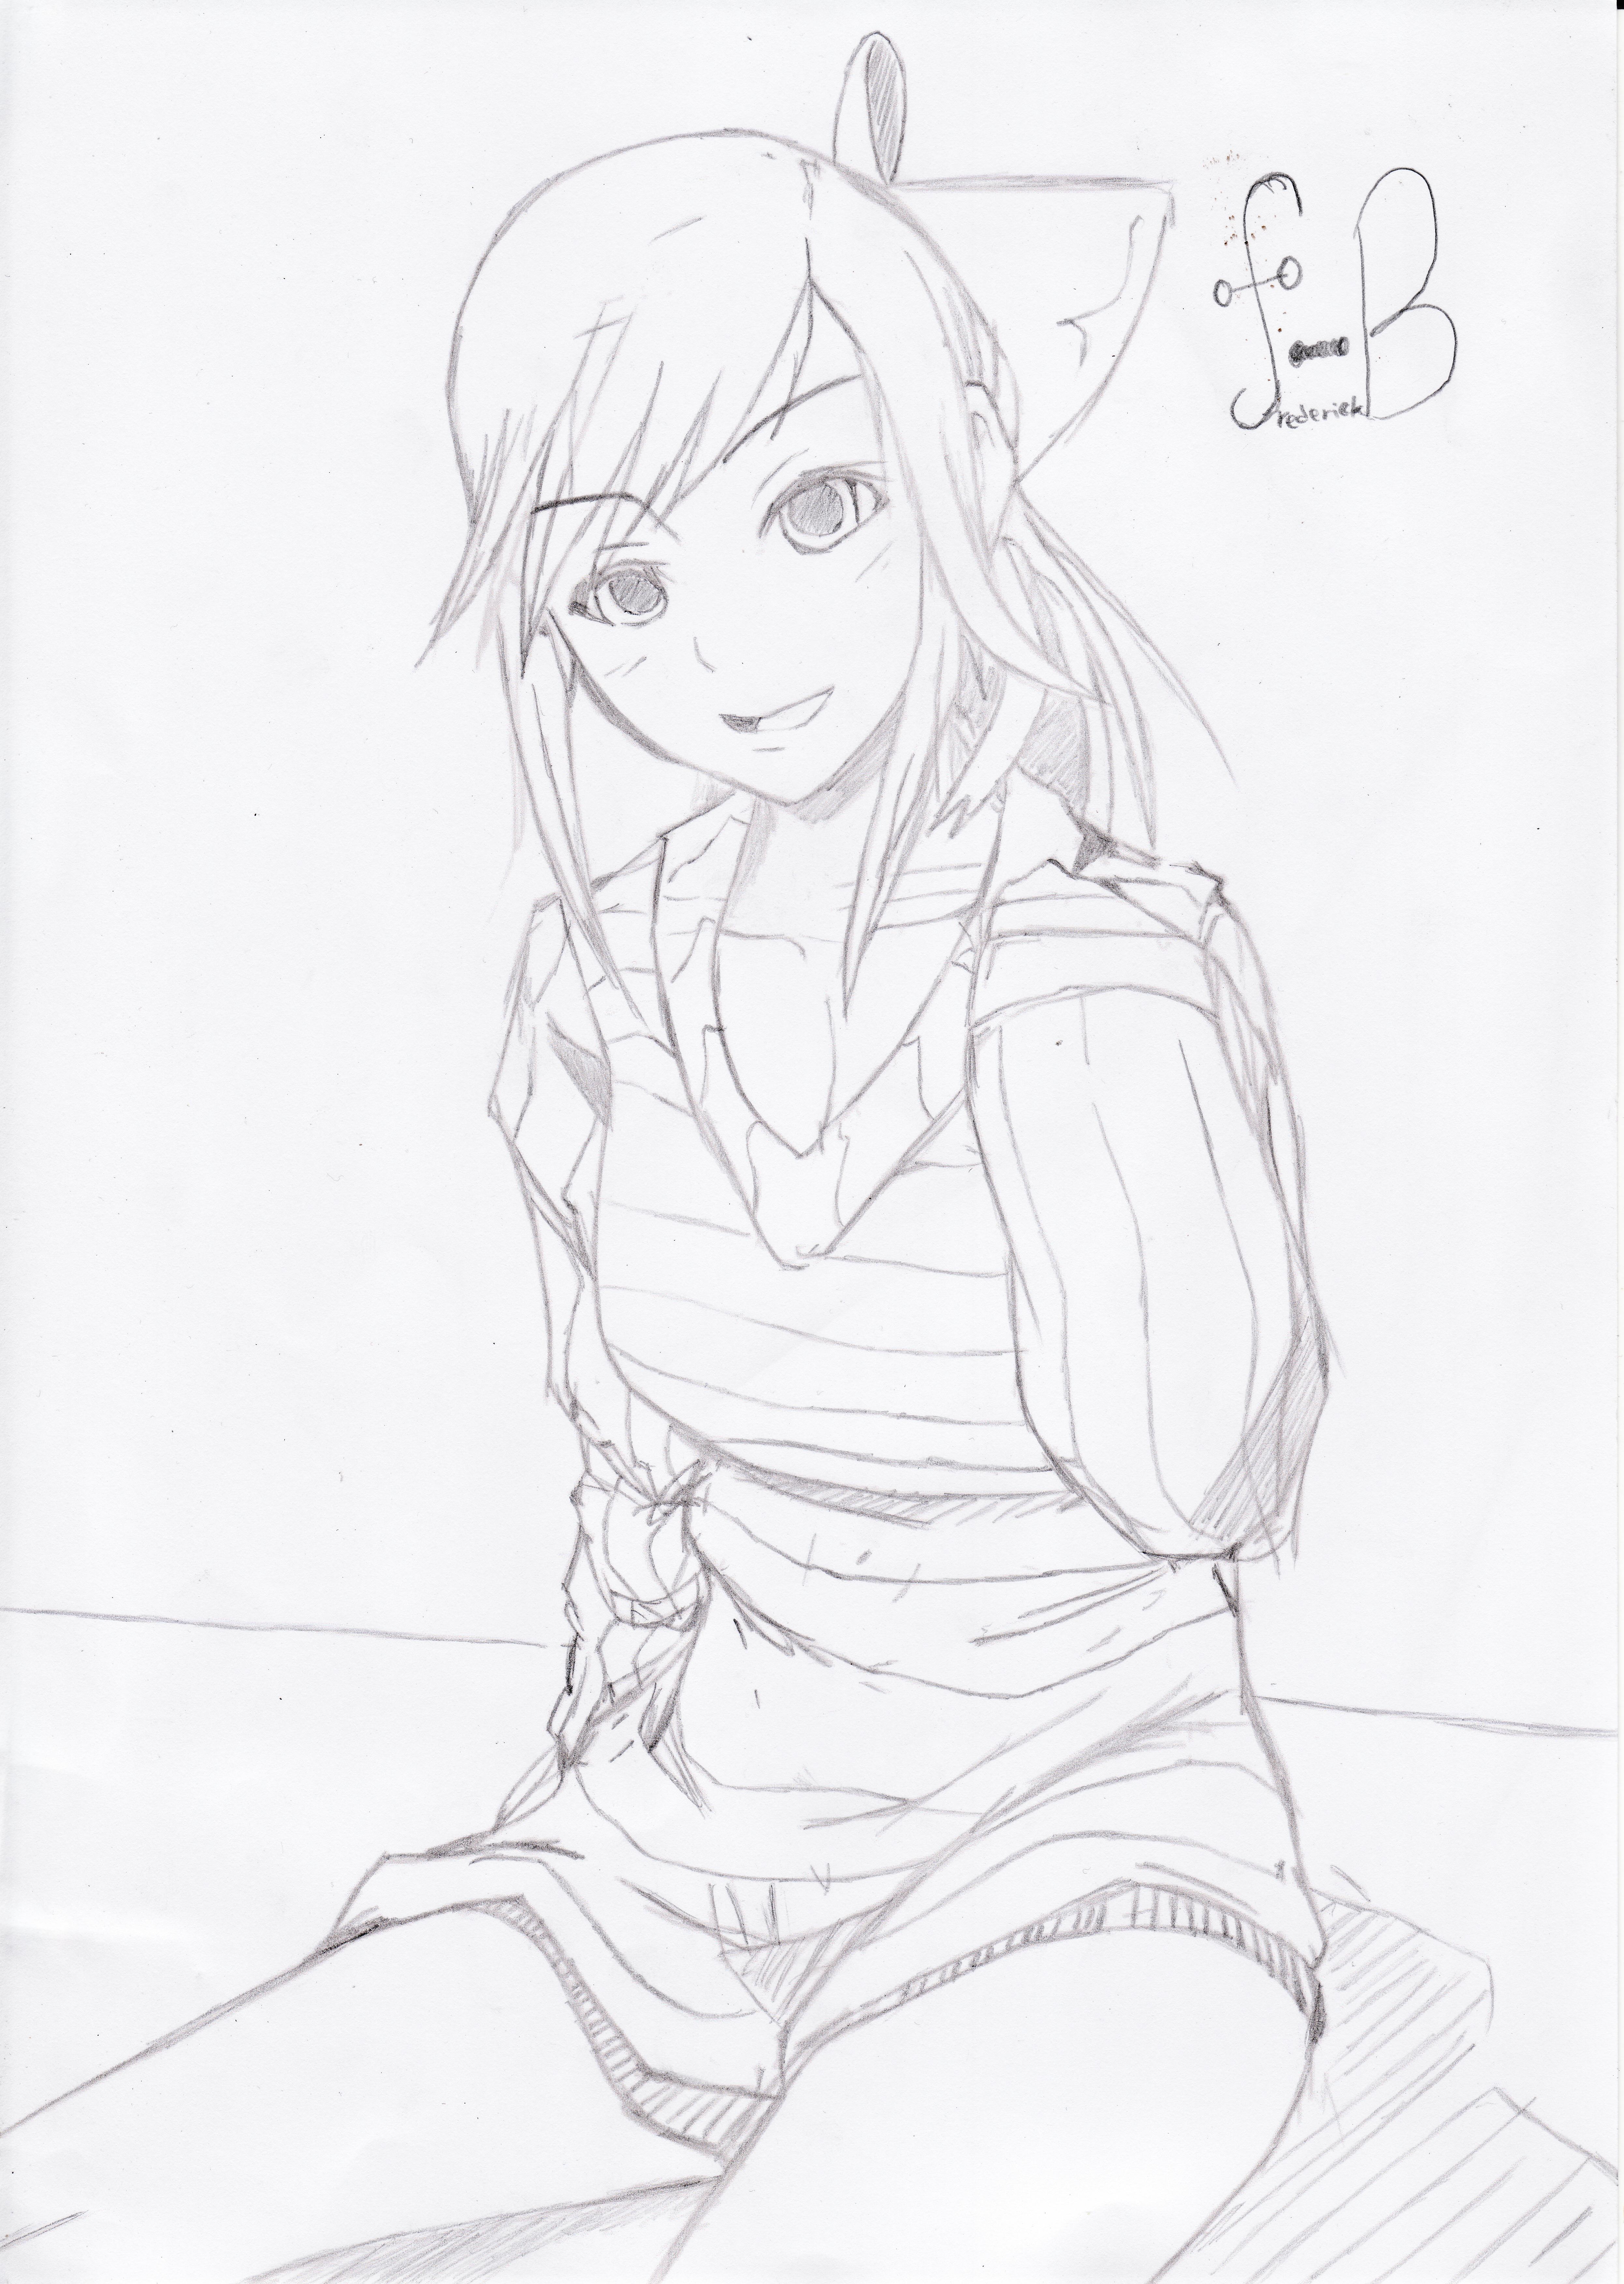 Anime Girl Sitting By Destroyerf On DeviantArt